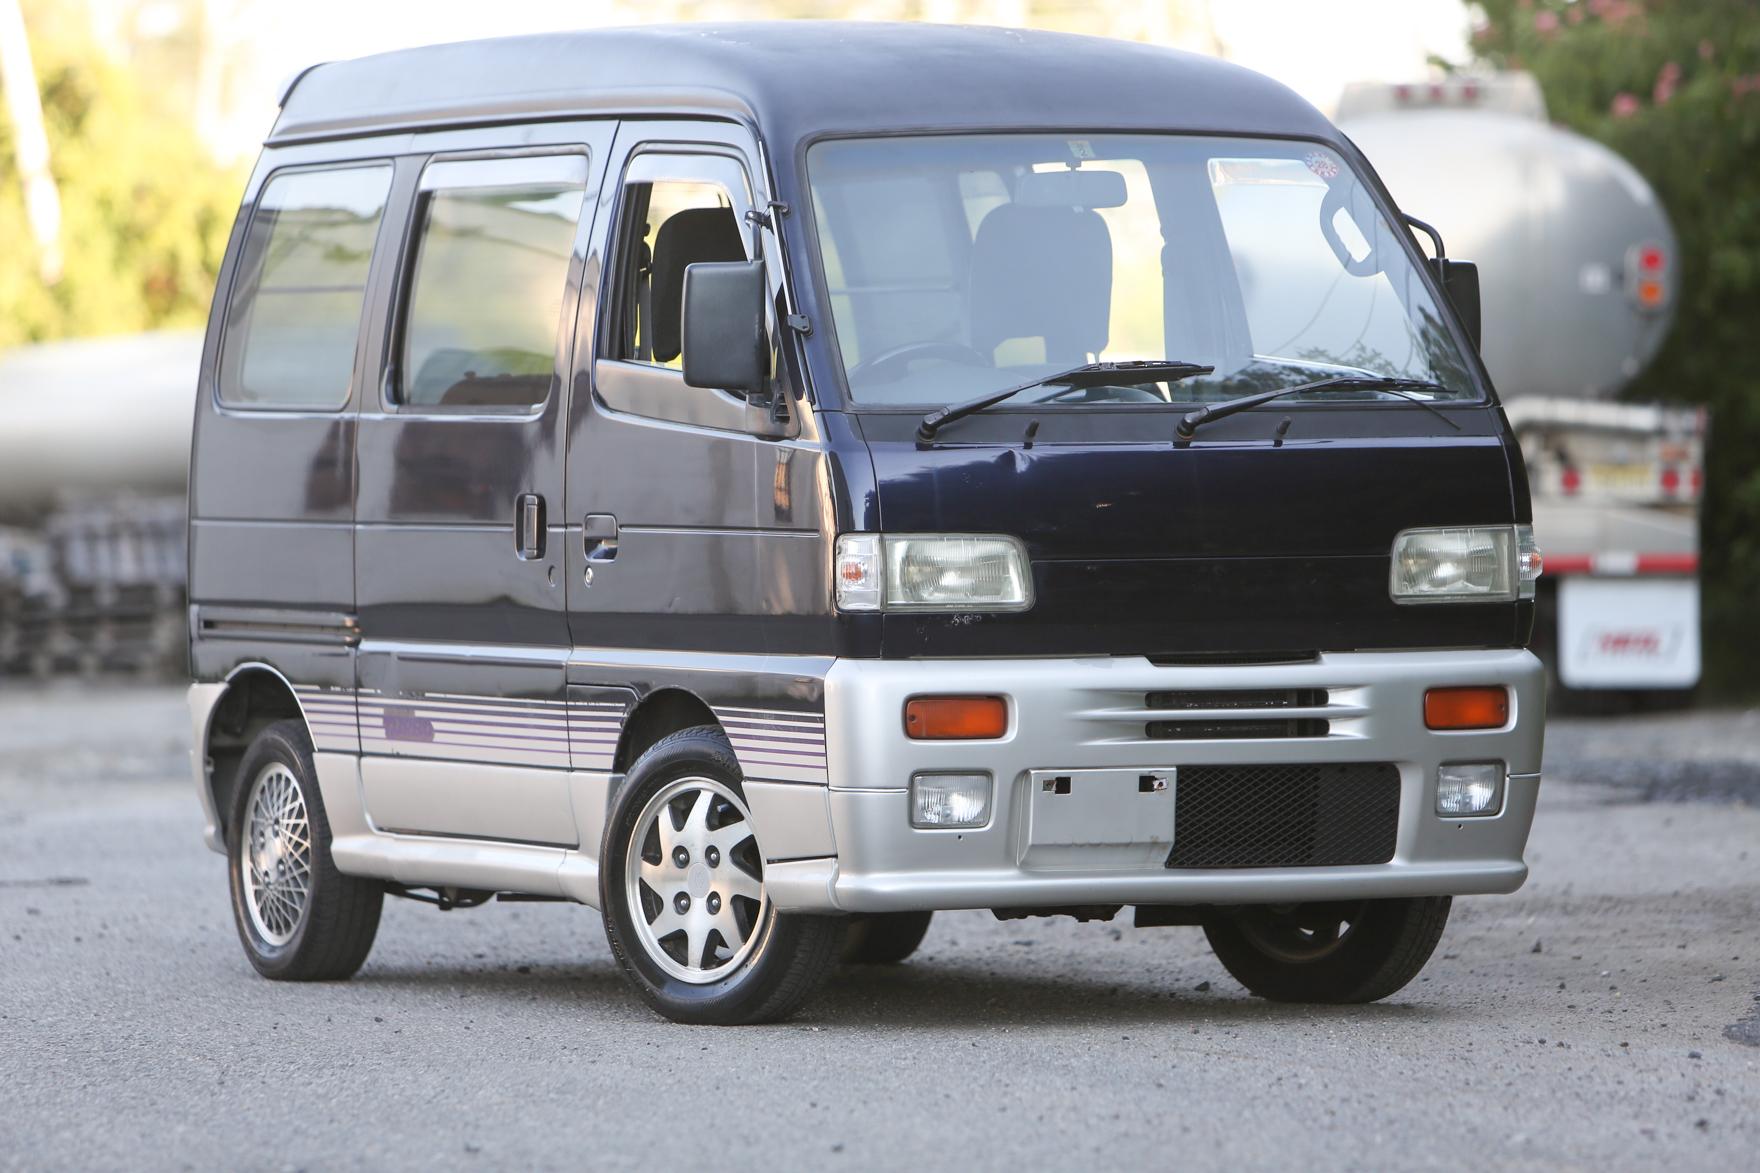 1992 Suzuki Every Van 4WD TURBO - $7,500